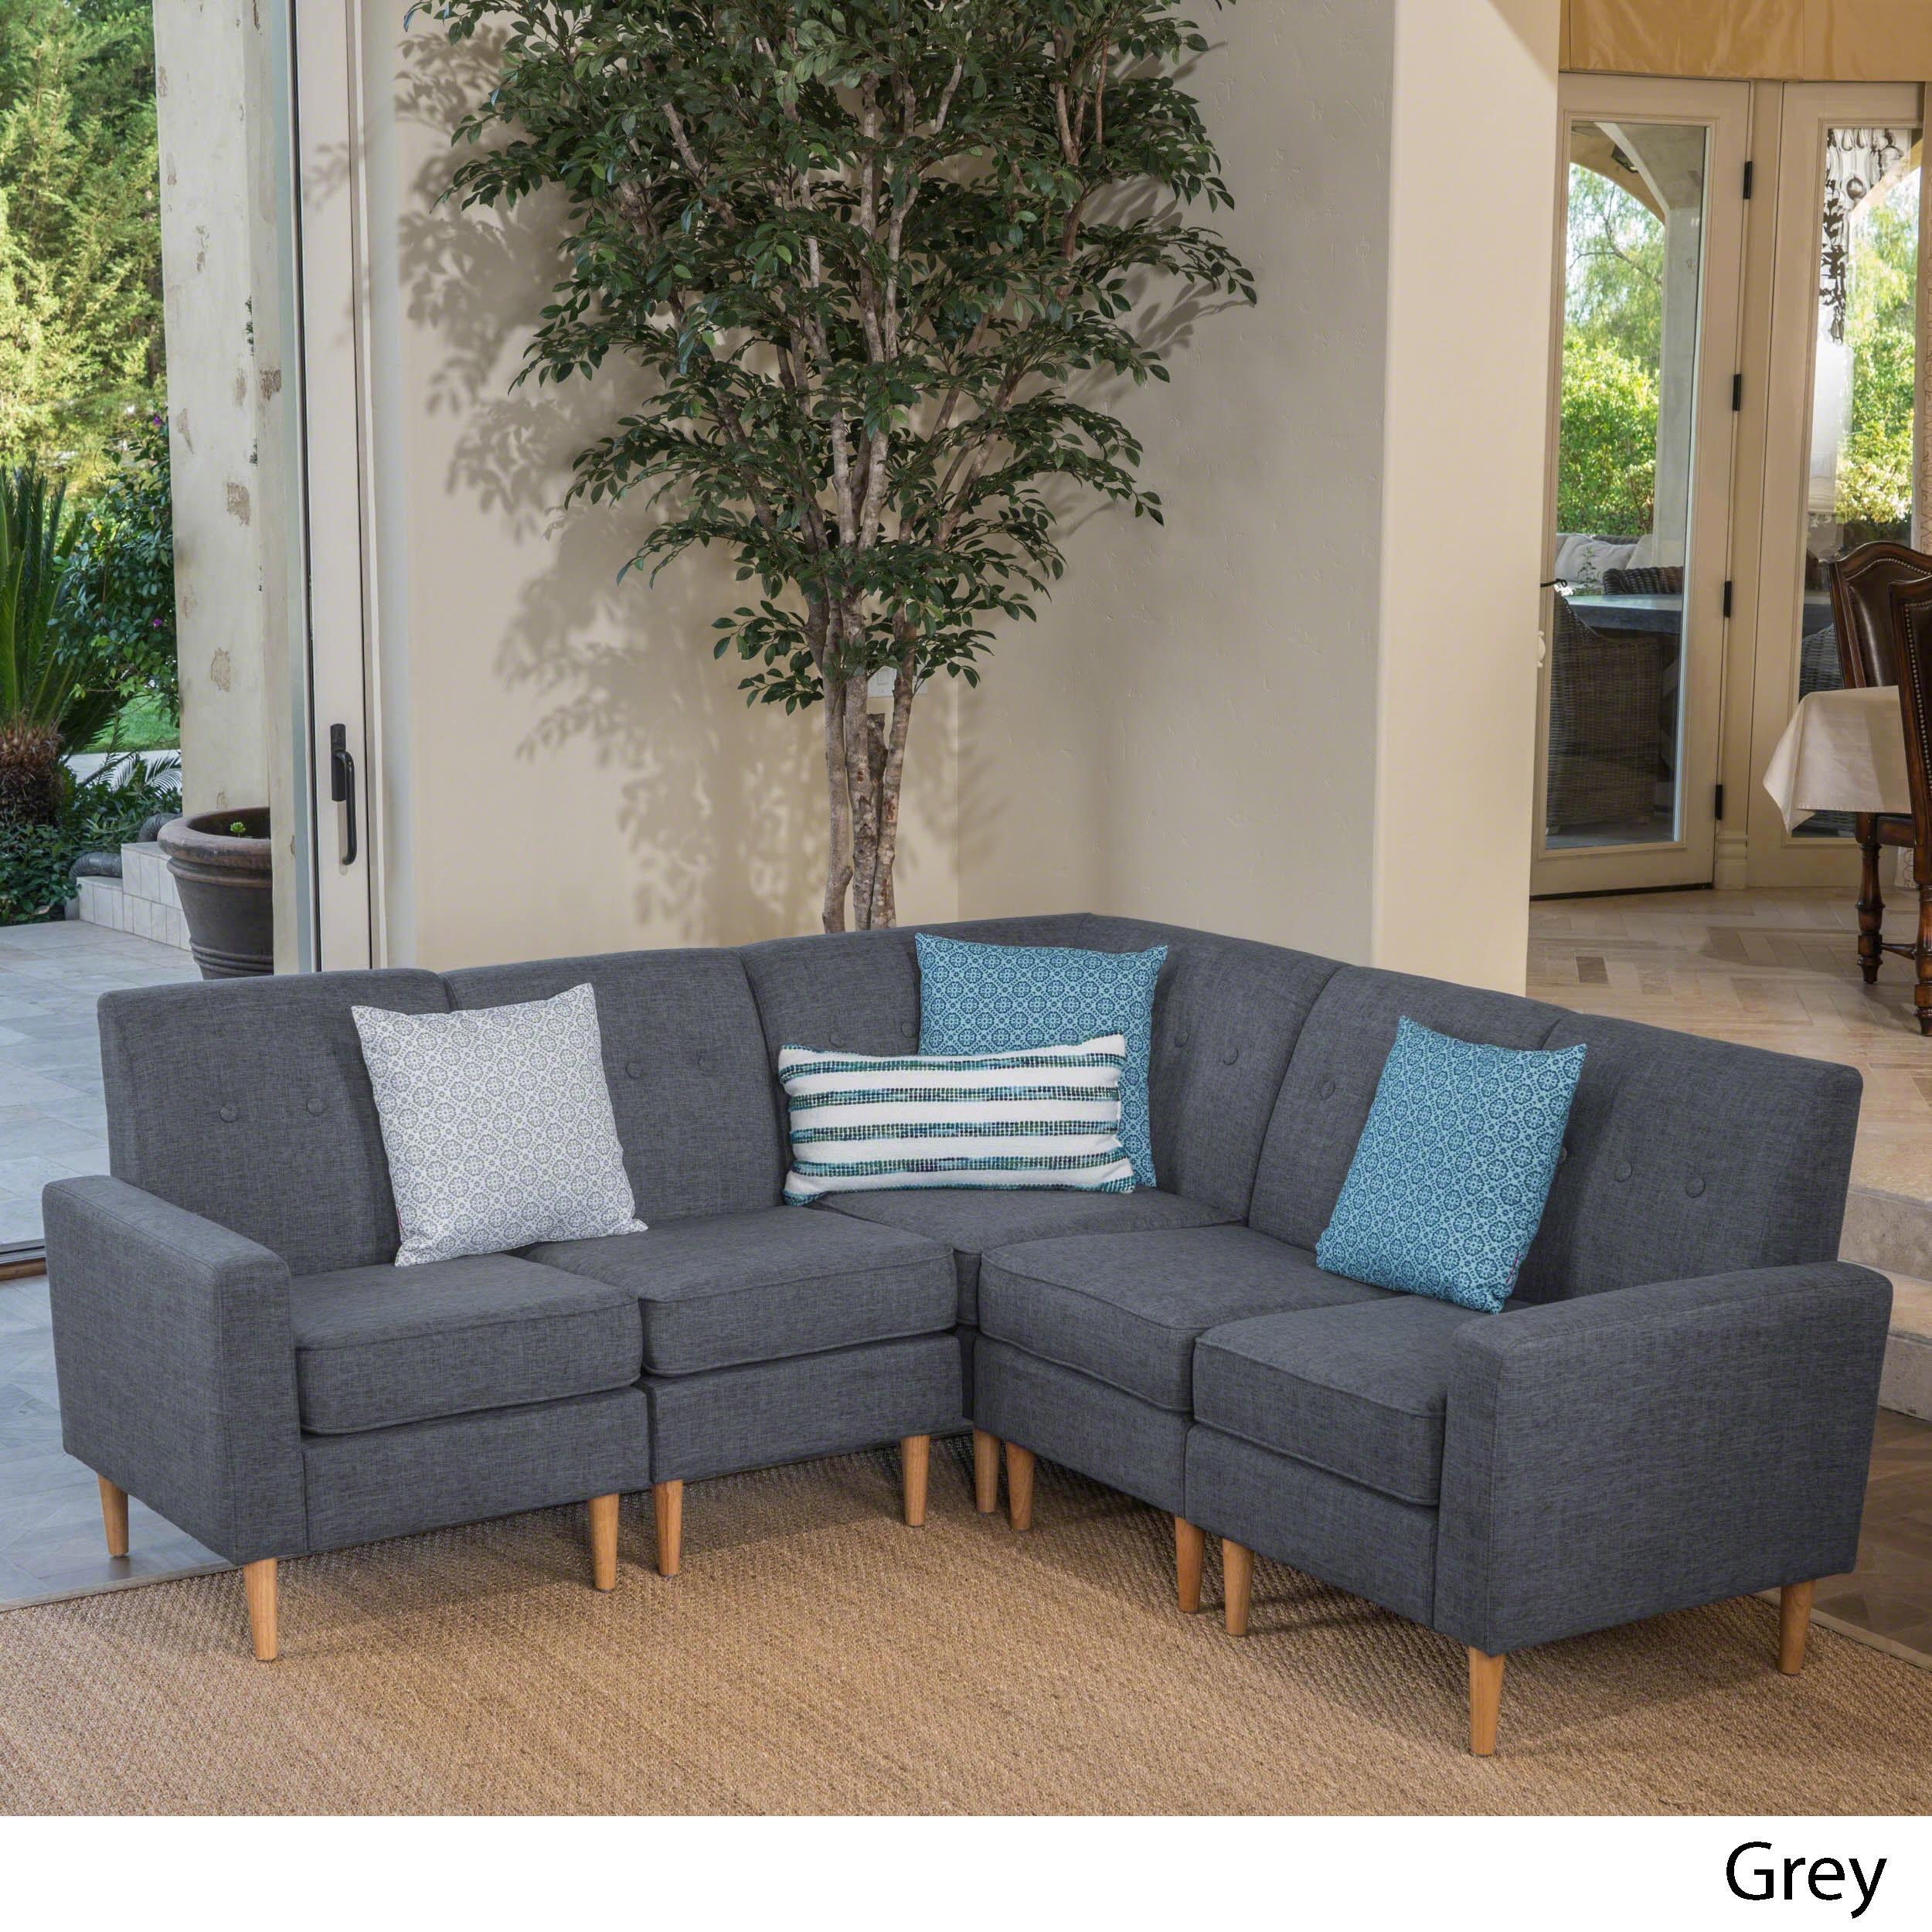 Shop Sawyer Mid Century Modern 5-piece Fabric Sectional Sofa Set by ...